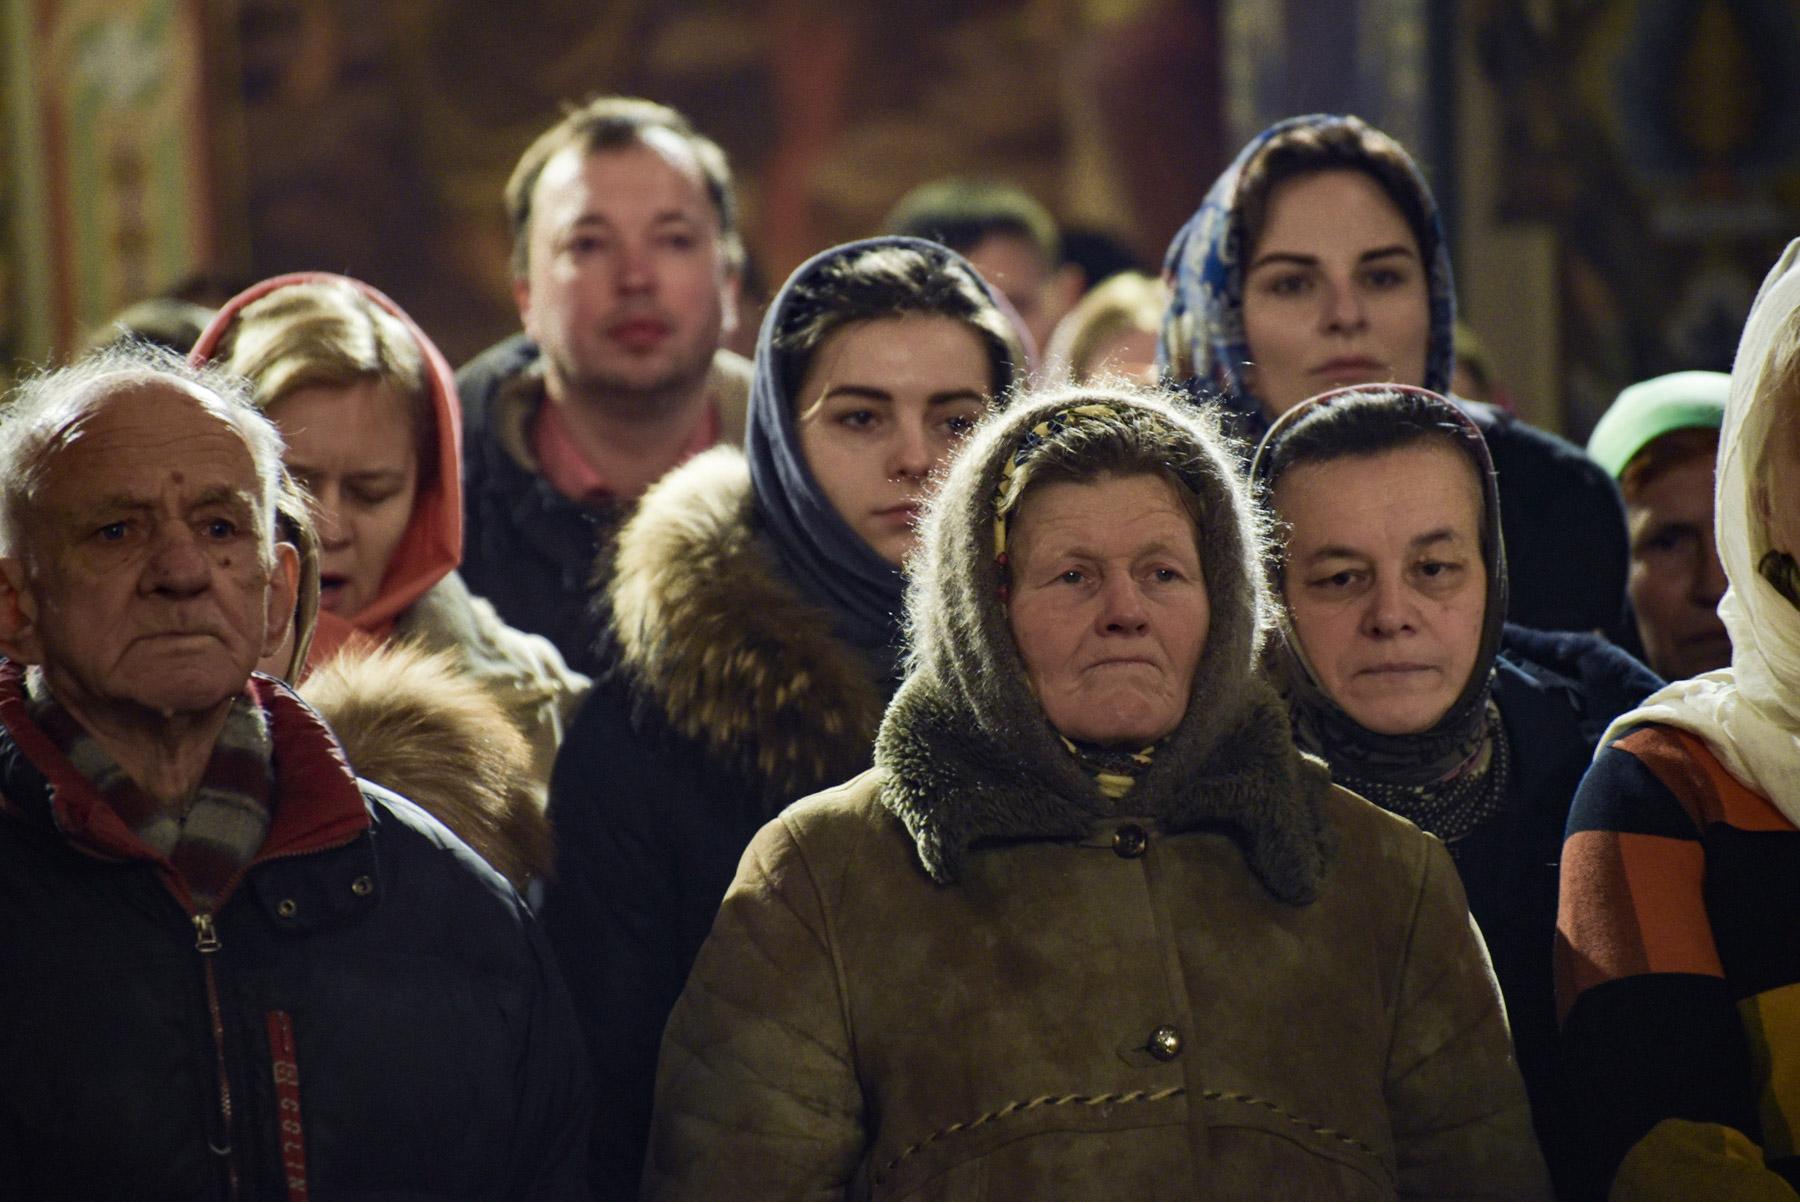 photos of orthodox christmas 0094 2